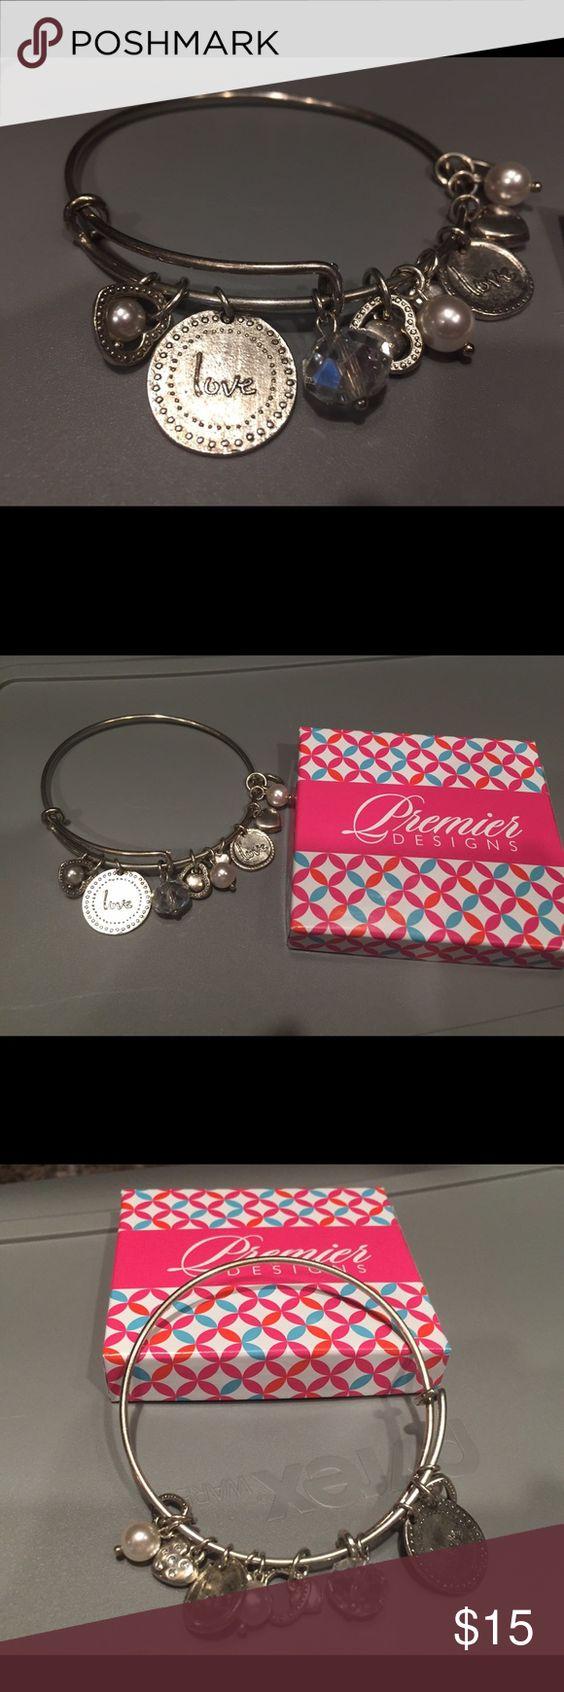 Premier Designs Love Bangle Bracelet EUC beautiful silver-plated Premier Designs bracelet. Similar to Alex & Ani style. Premier Designs Jewelry Bracelets